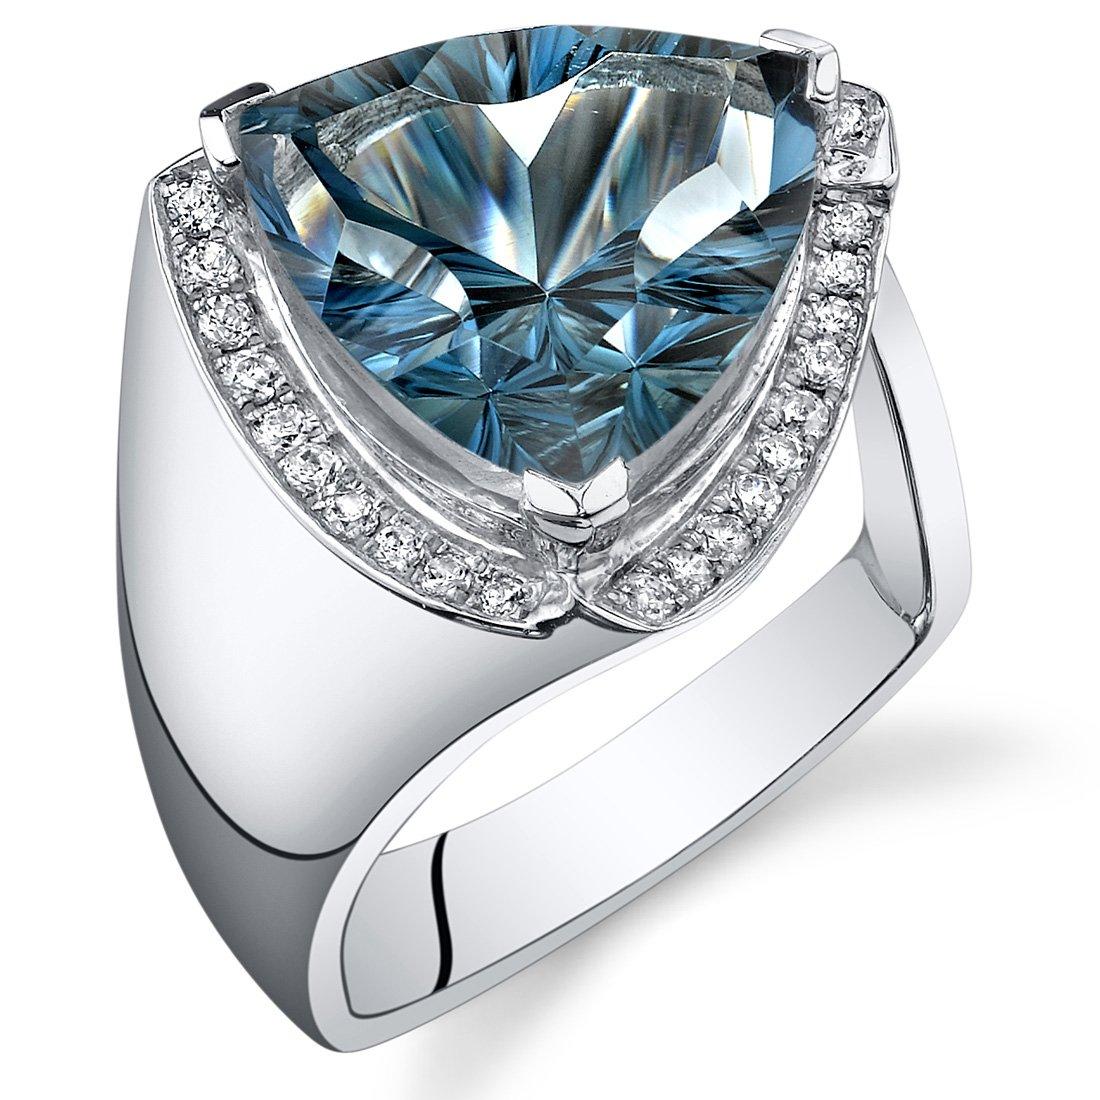 7.00 Carats London Blue Topaz Ring Sterling Silver Concave Trillion Cut Size 8